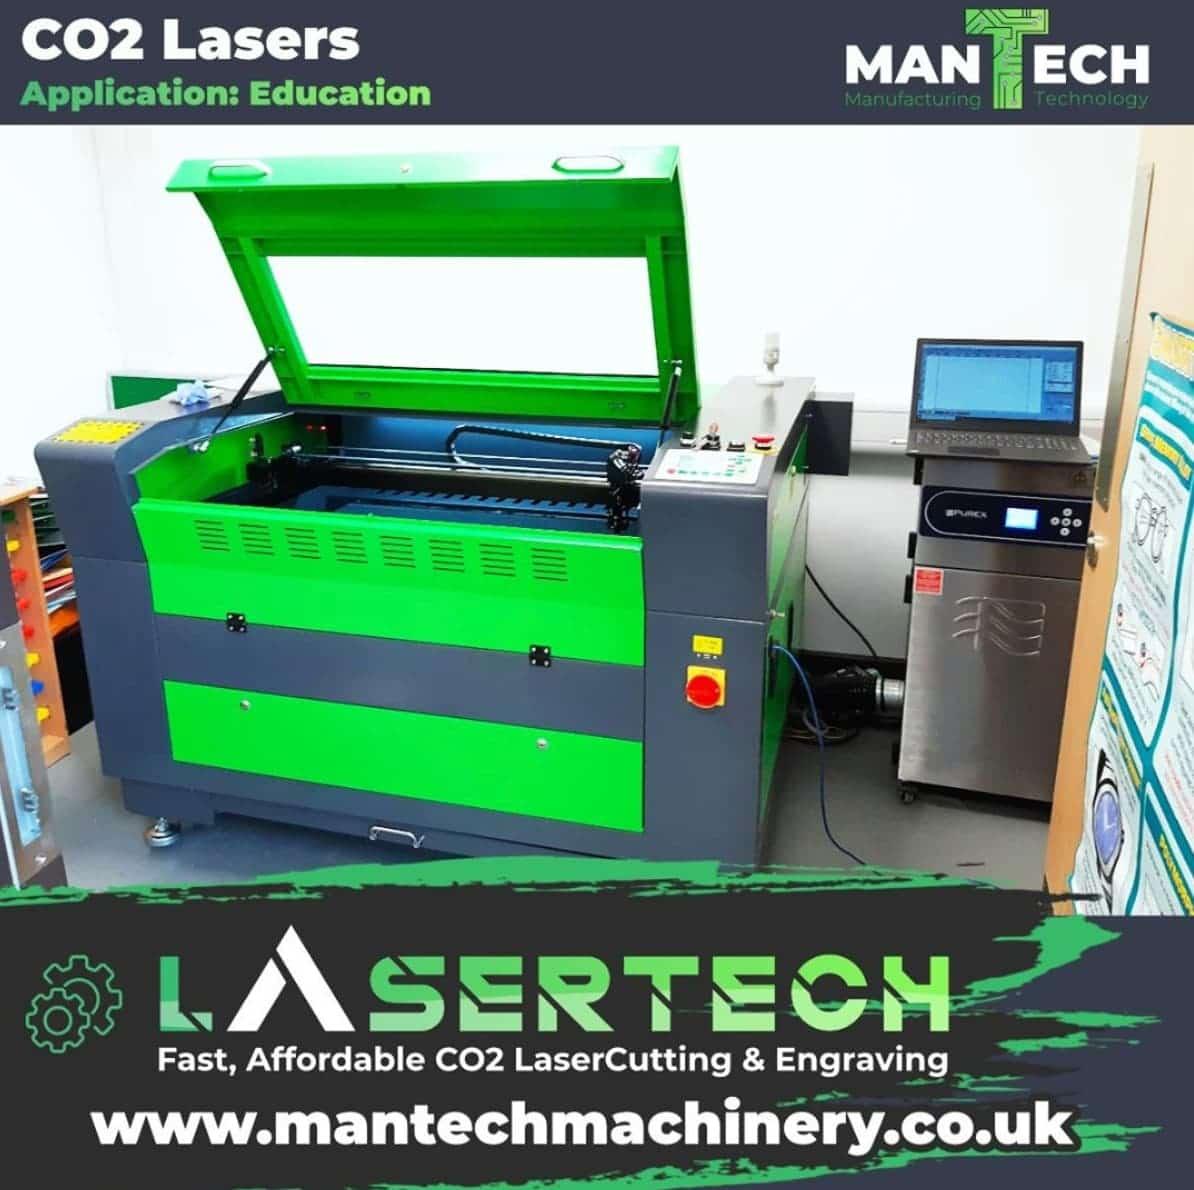 School in Colchester - Laser Cutter